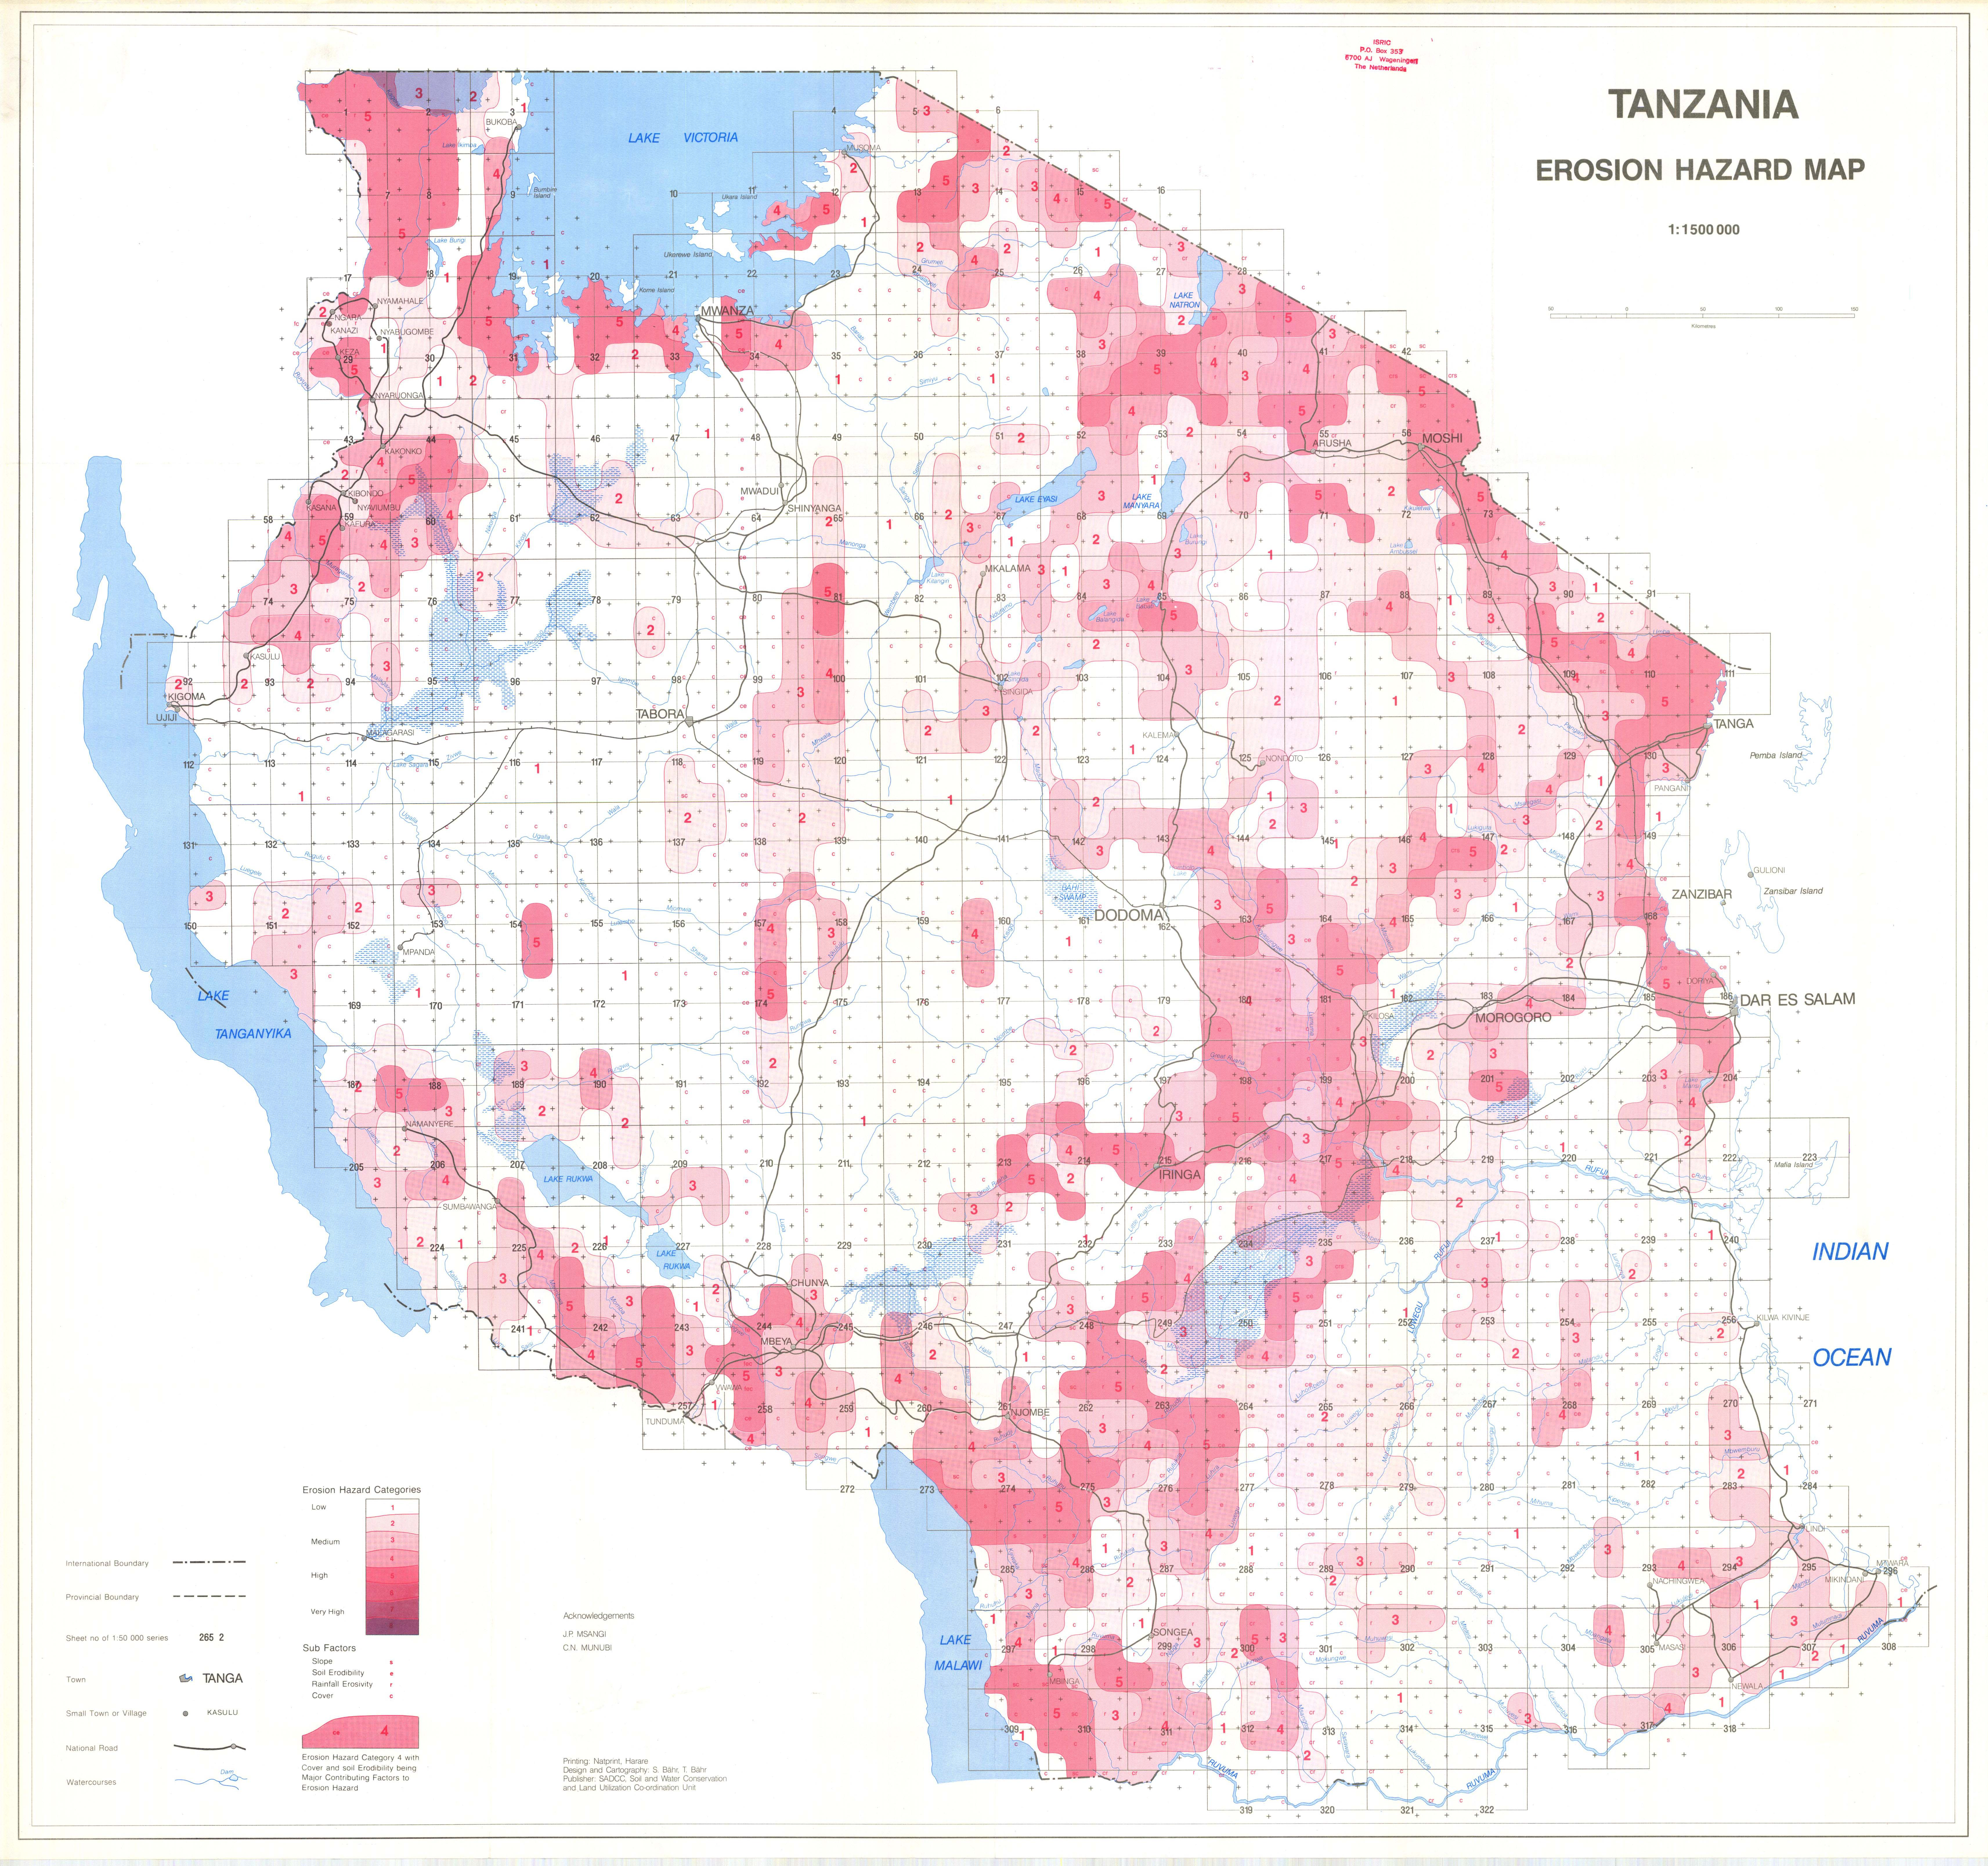 Tanzania  Erosion Hazard Map  - ESDAC - European Commission